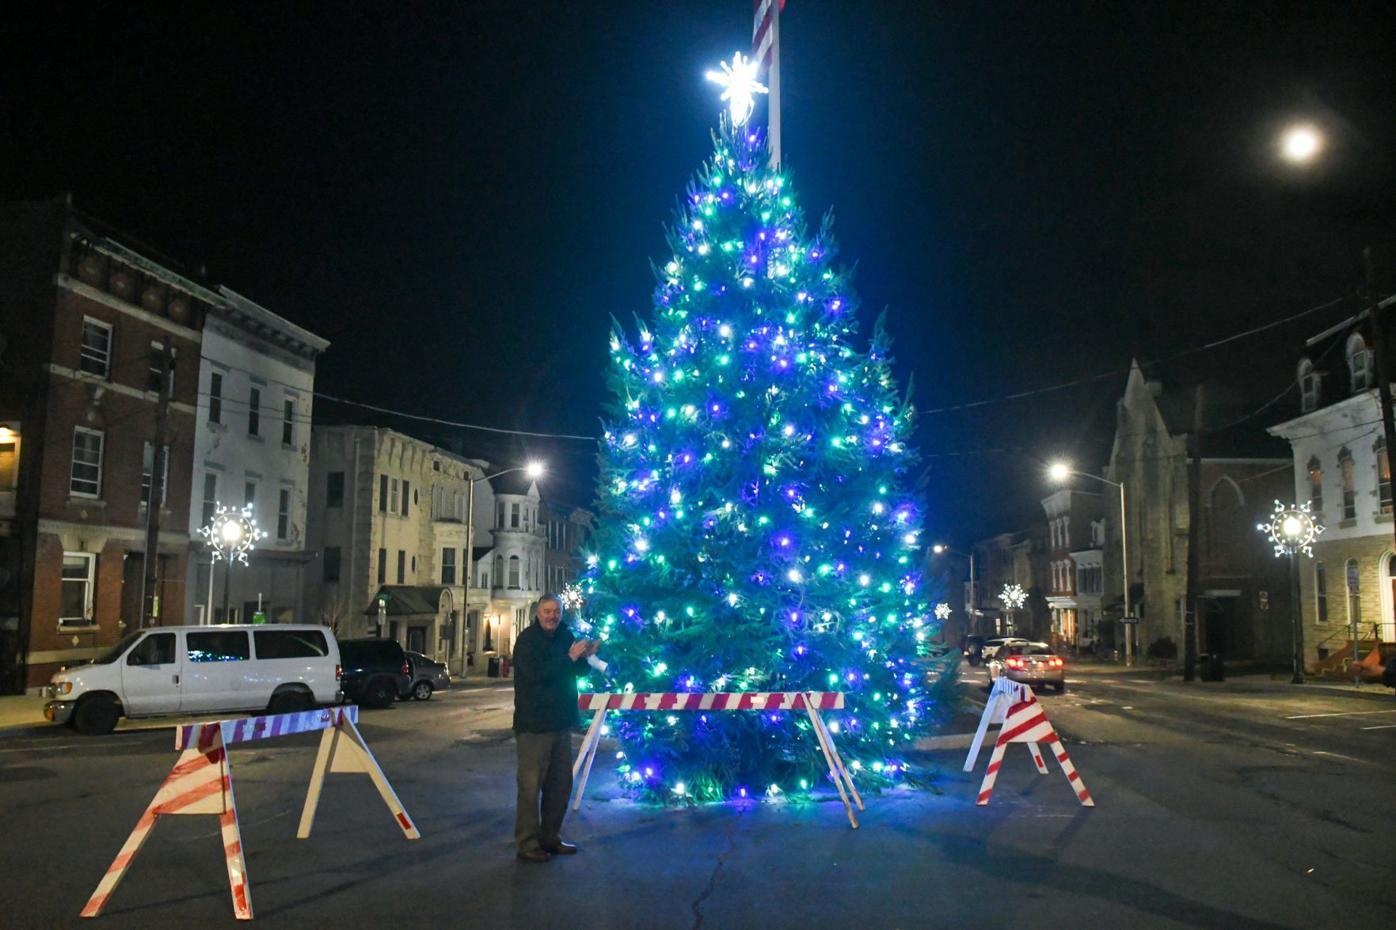 Pittston City Christmas Tree Lighting 2021 Lighting The Christmas Tree In Pottsville News Republicanherald Com